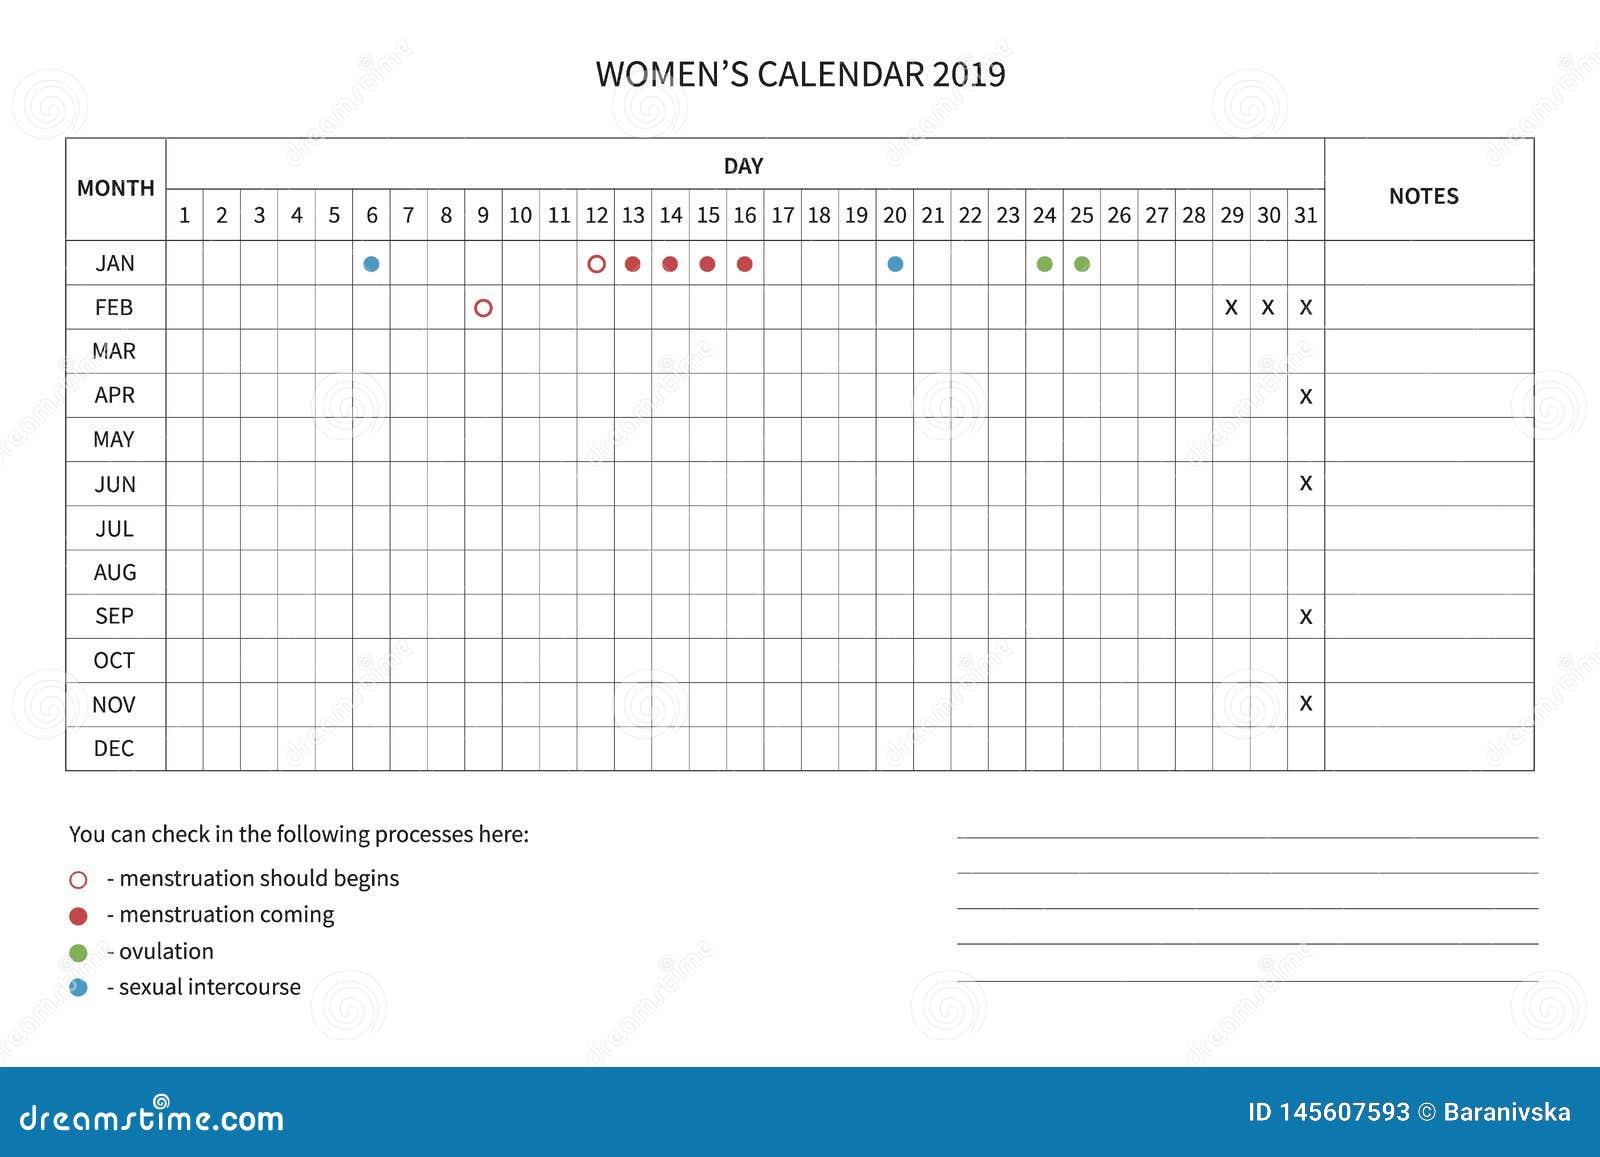 Women cycle calendar